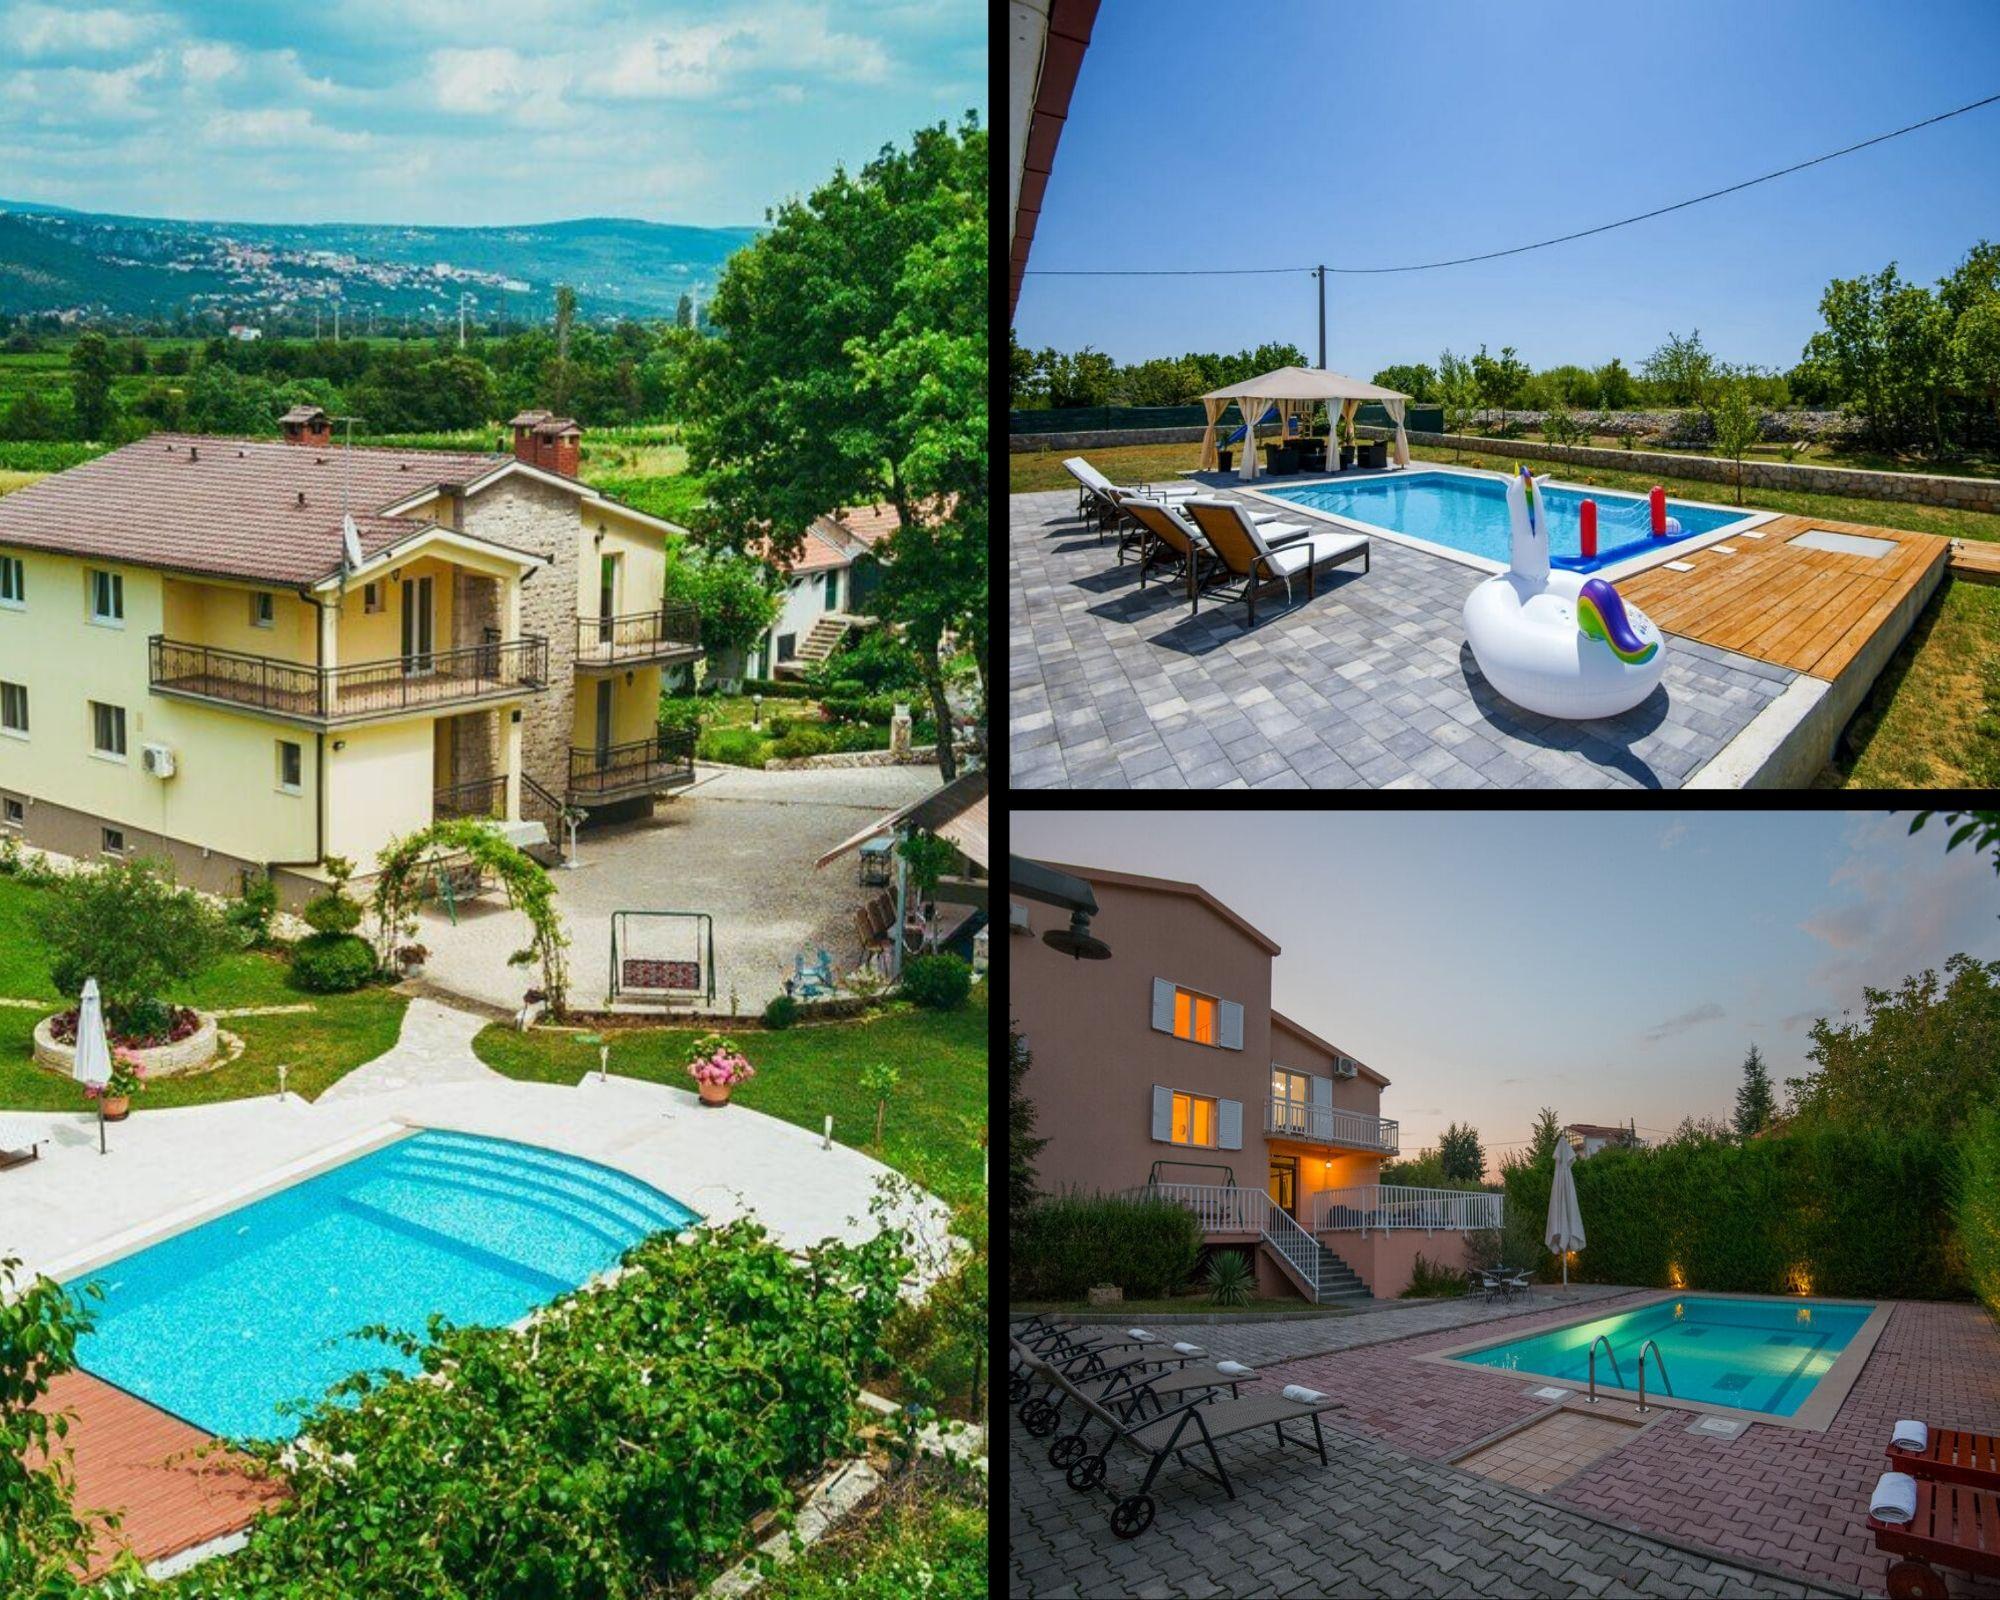 Imotski – Villen mit privatem Pool